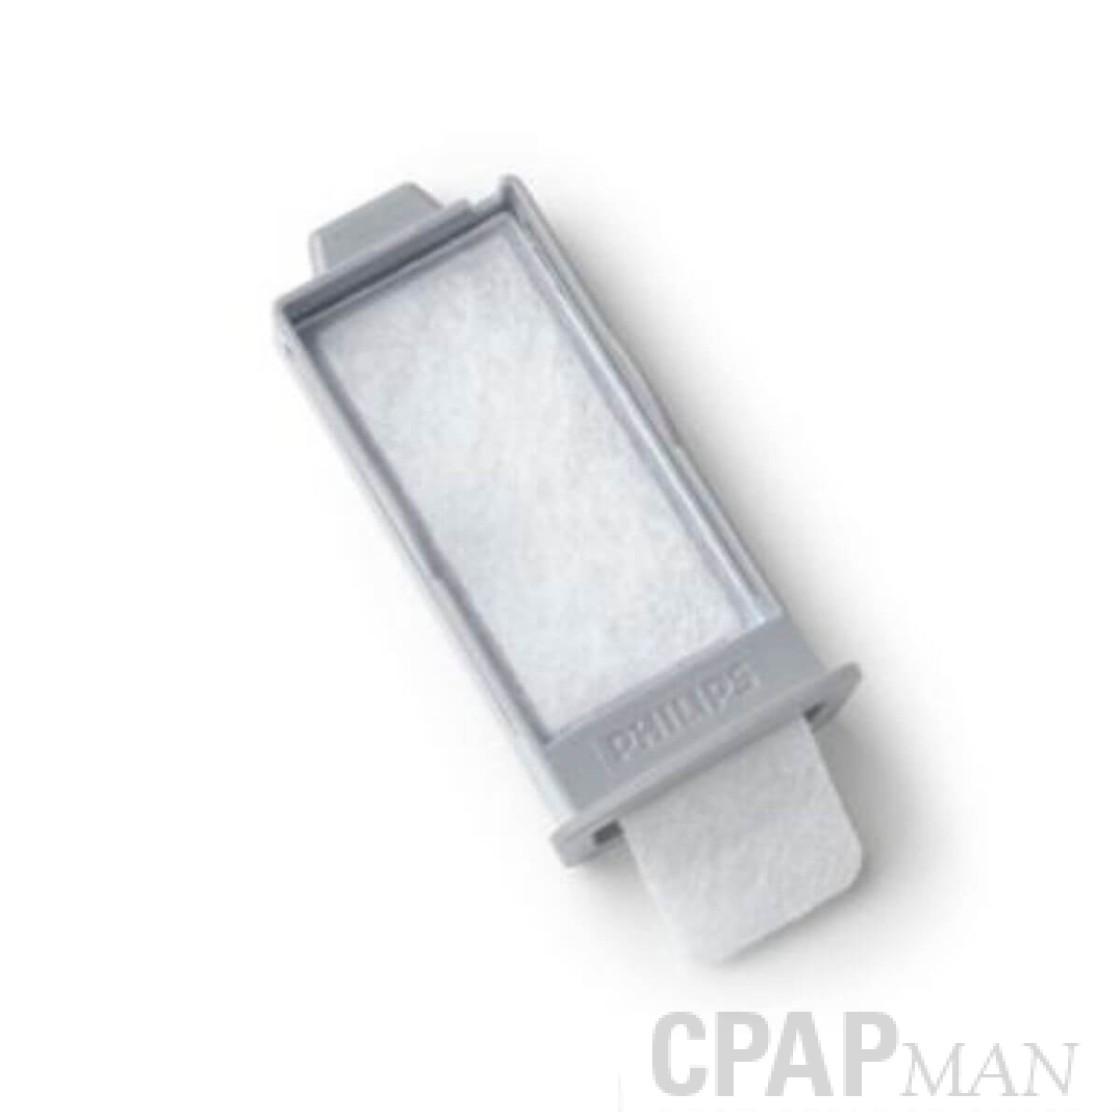 DreamStation 2 Auto CPAP Reusable Pollen Filter - Philips